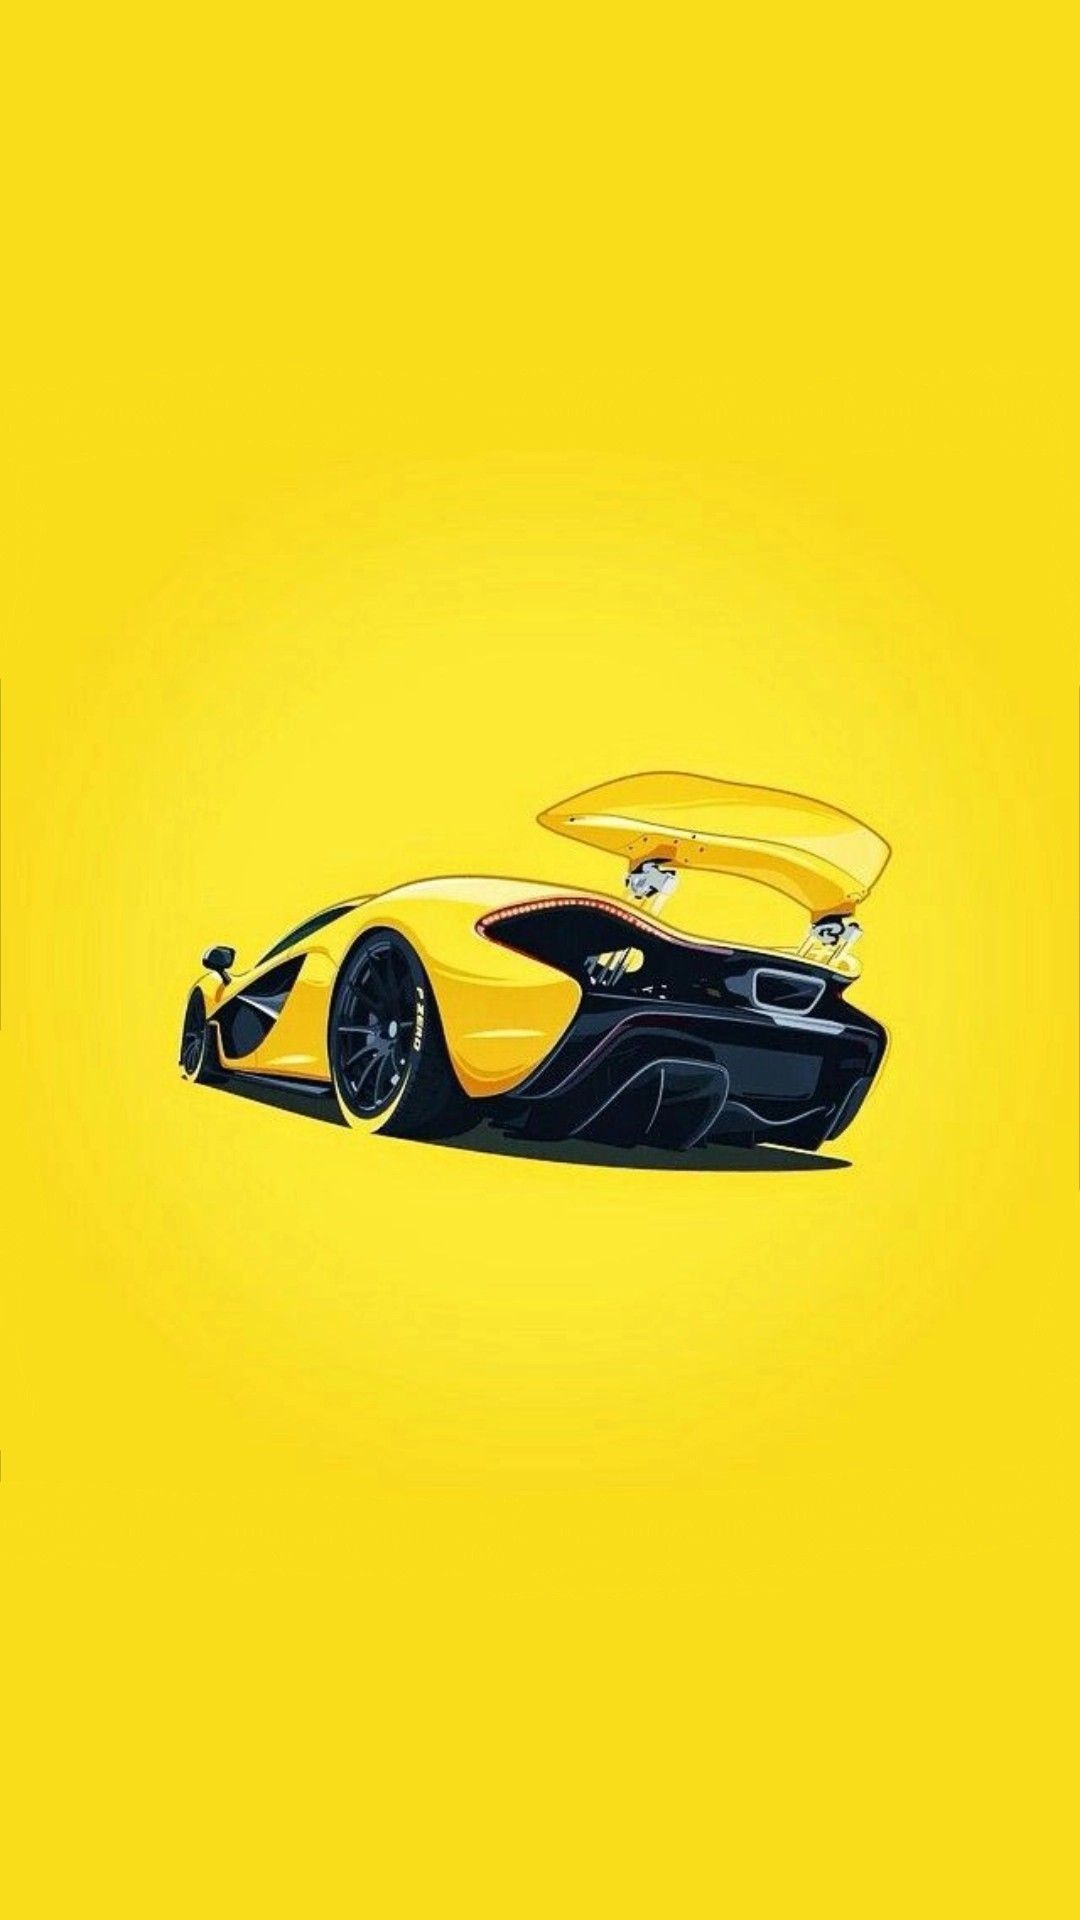 Pin By Zachary Isaiah On Jrs Car Artwork Car Iphone Wallpaper Art Cars